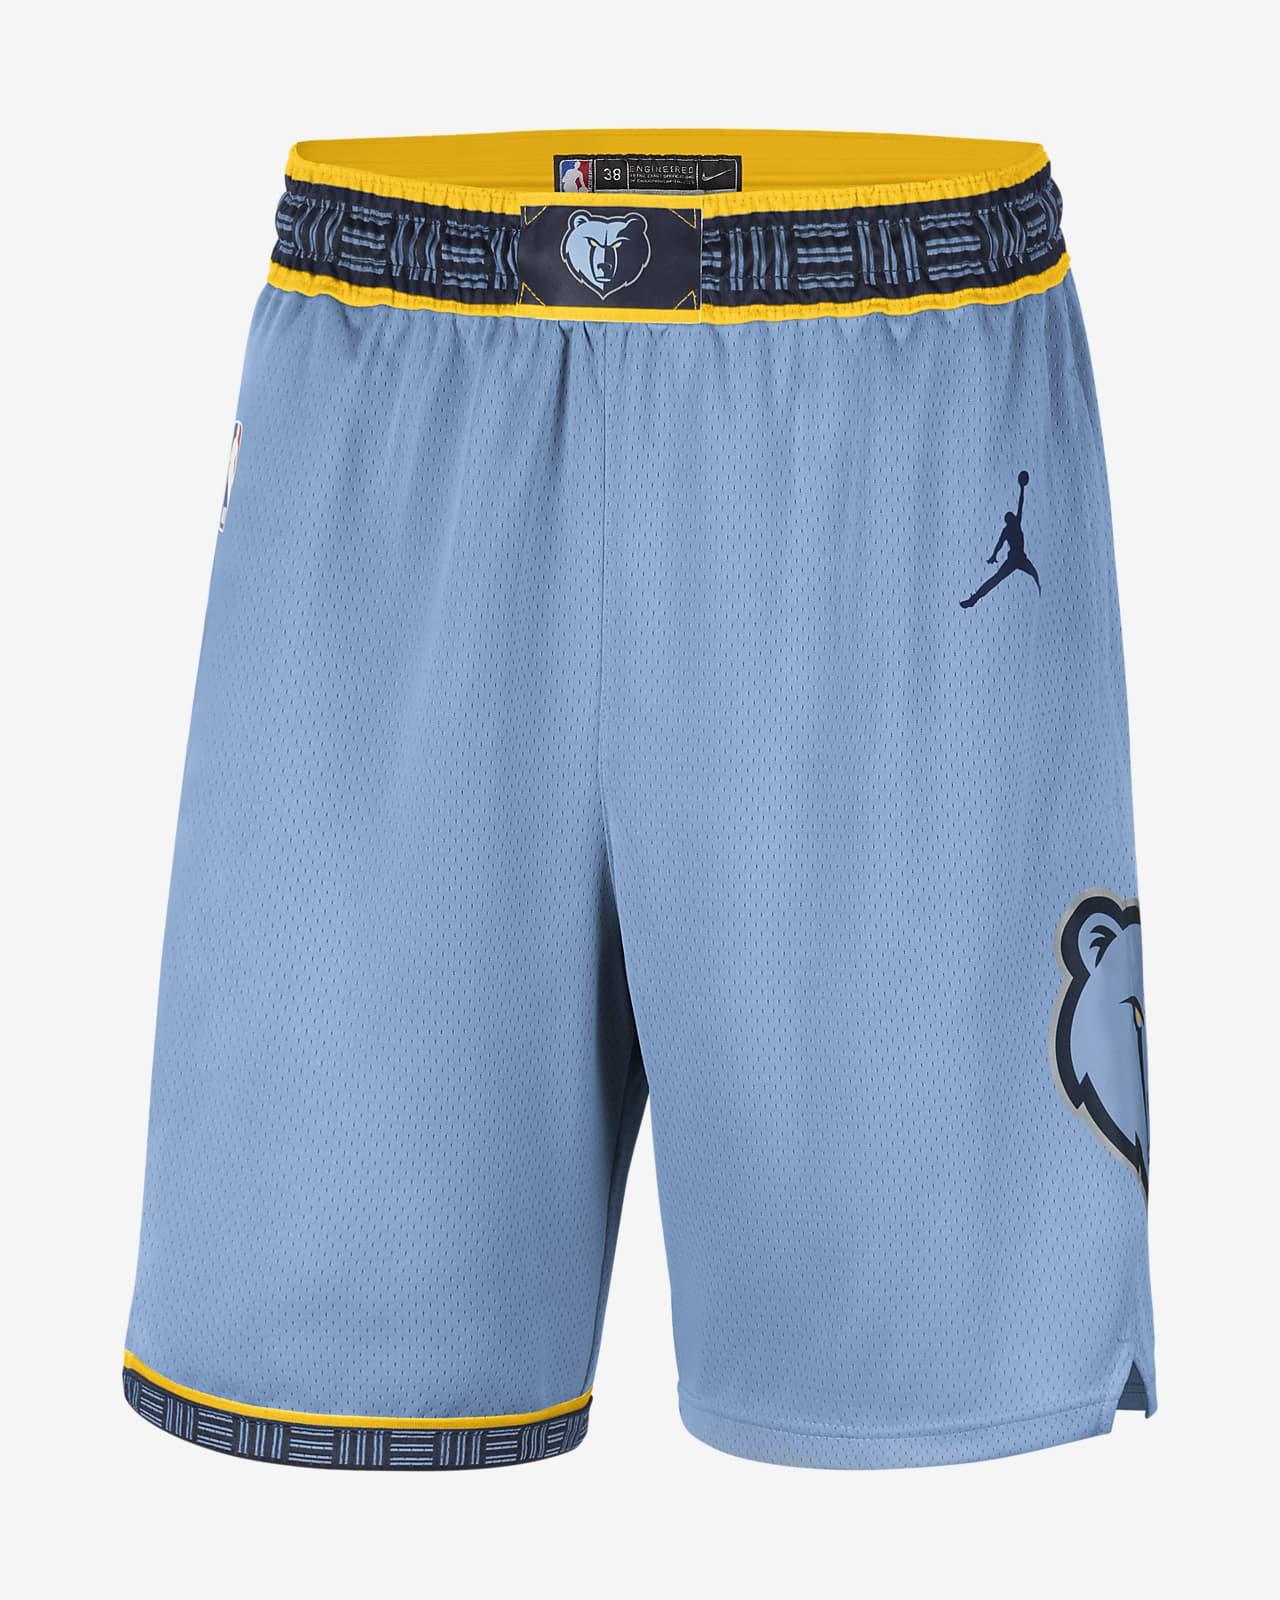 Grizzlies Statement Edition 2020 Men's Jordan NBA Swingman Shorts